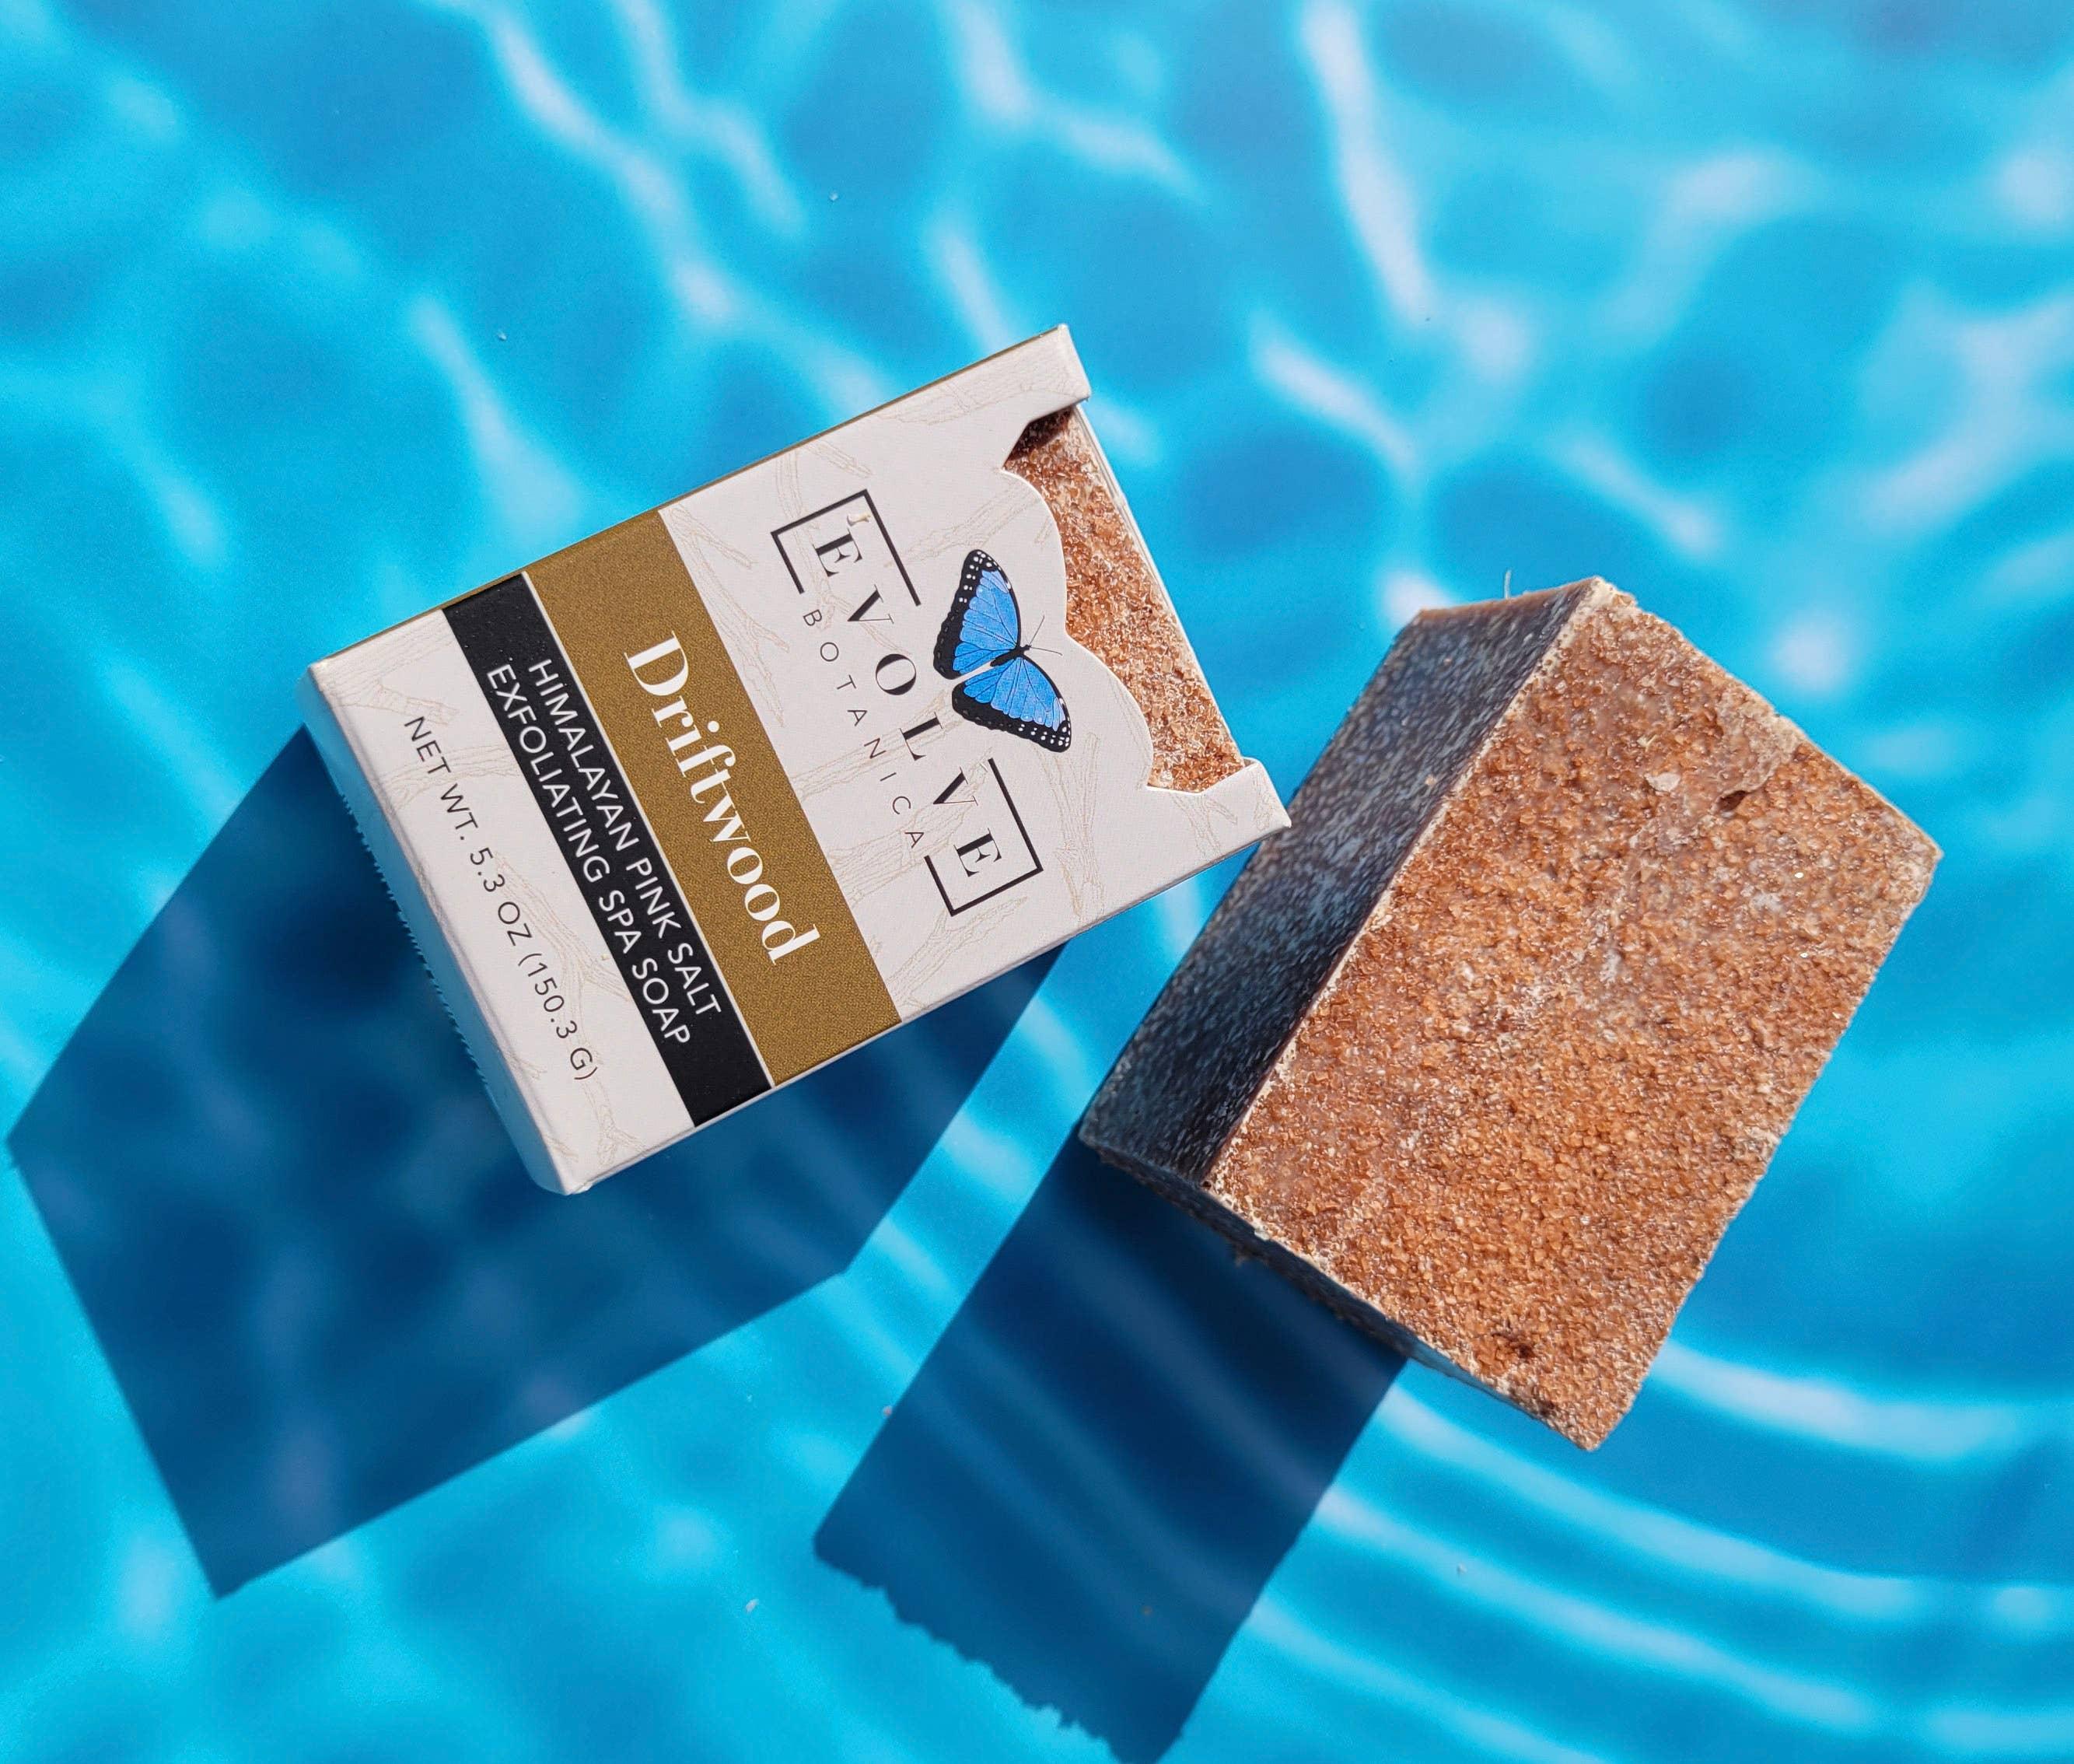 Evolve - Specialty Soap - Driftwood Salt Bar | Trada Marketplace